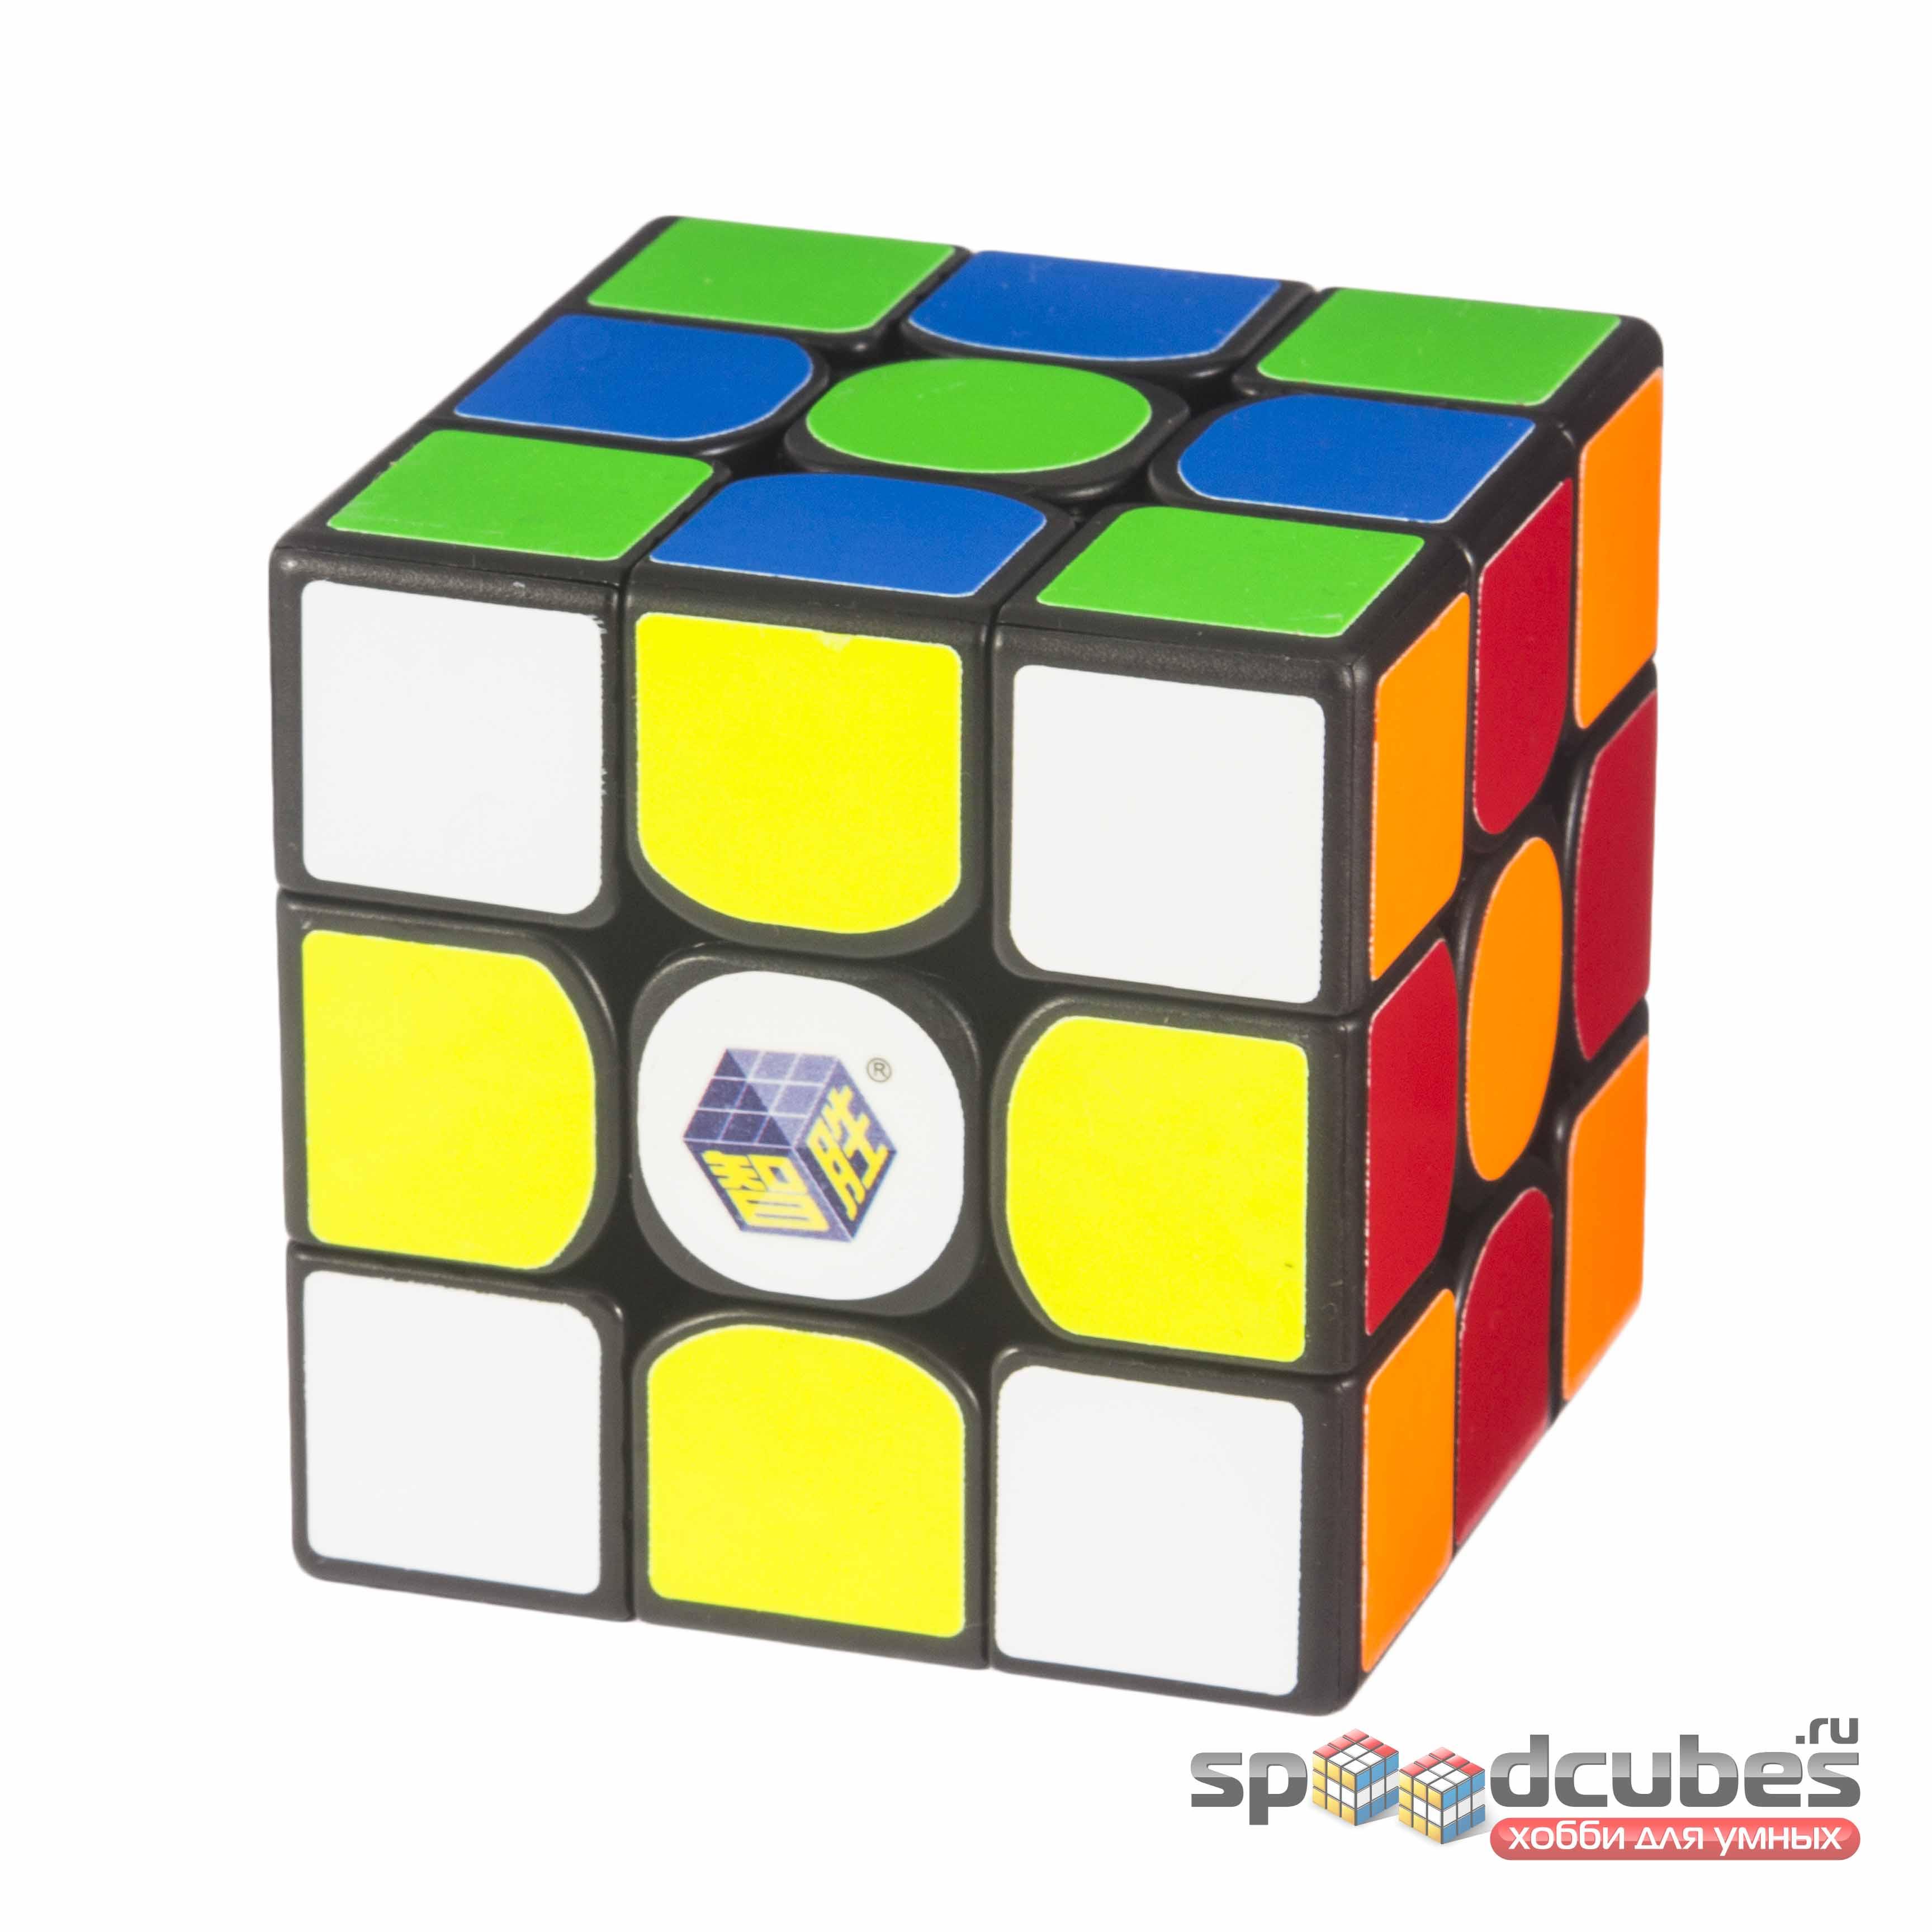 Yuxin 3x3x3 Little Magic Black 3